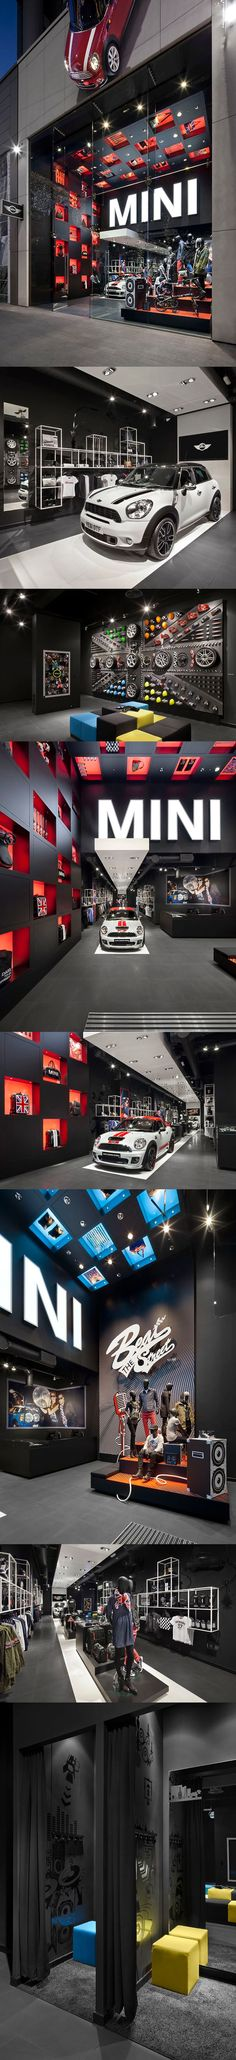 Retail Architecture, Shop Facade, Showroom Interior Design, Environmental Design, Exhibition Space, Facade Design, Car Shop, Stand Design, Commercial Design